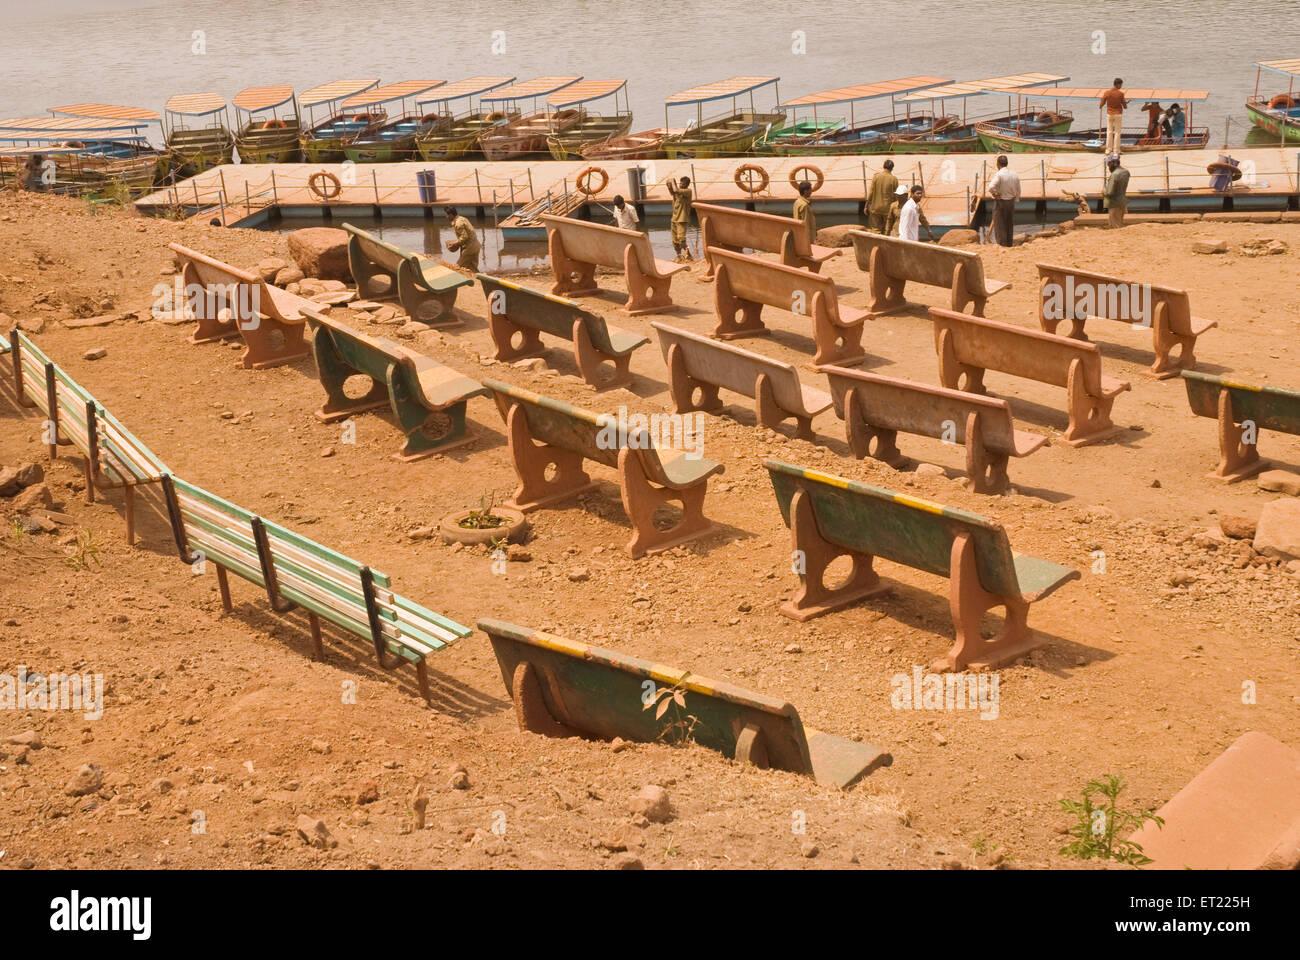 Venna lake boats and benches ; Mahableshwar ; District Satara ; Maharashtra ; India 2008 - Stock Image